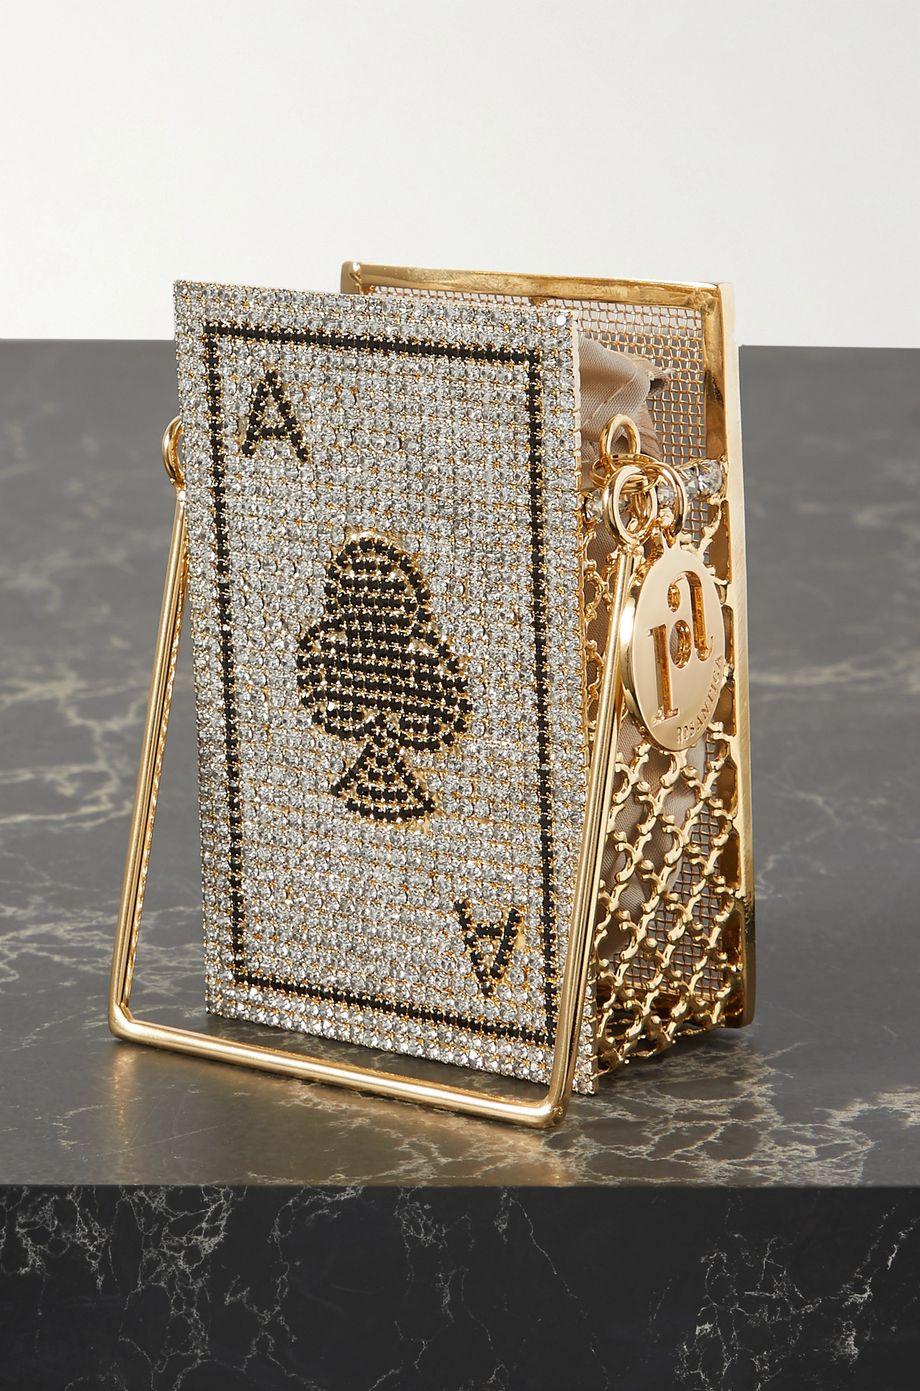 Rosantica Ace of Clubs goldfarbene Schultertasche mit Verzierungen